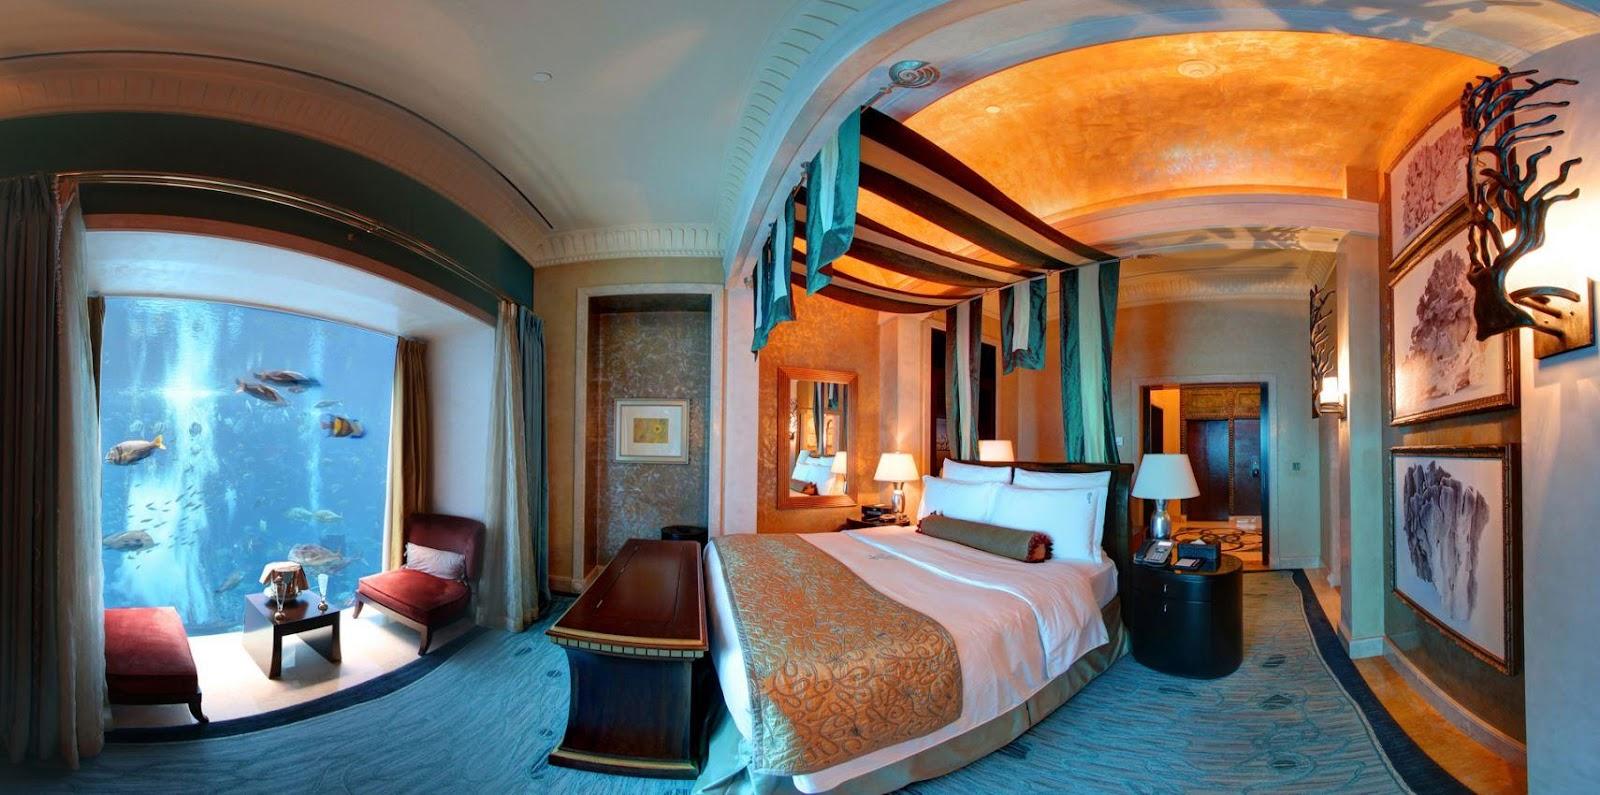 Explore Atlantis The Palm Dubai in 360   See Inside Group